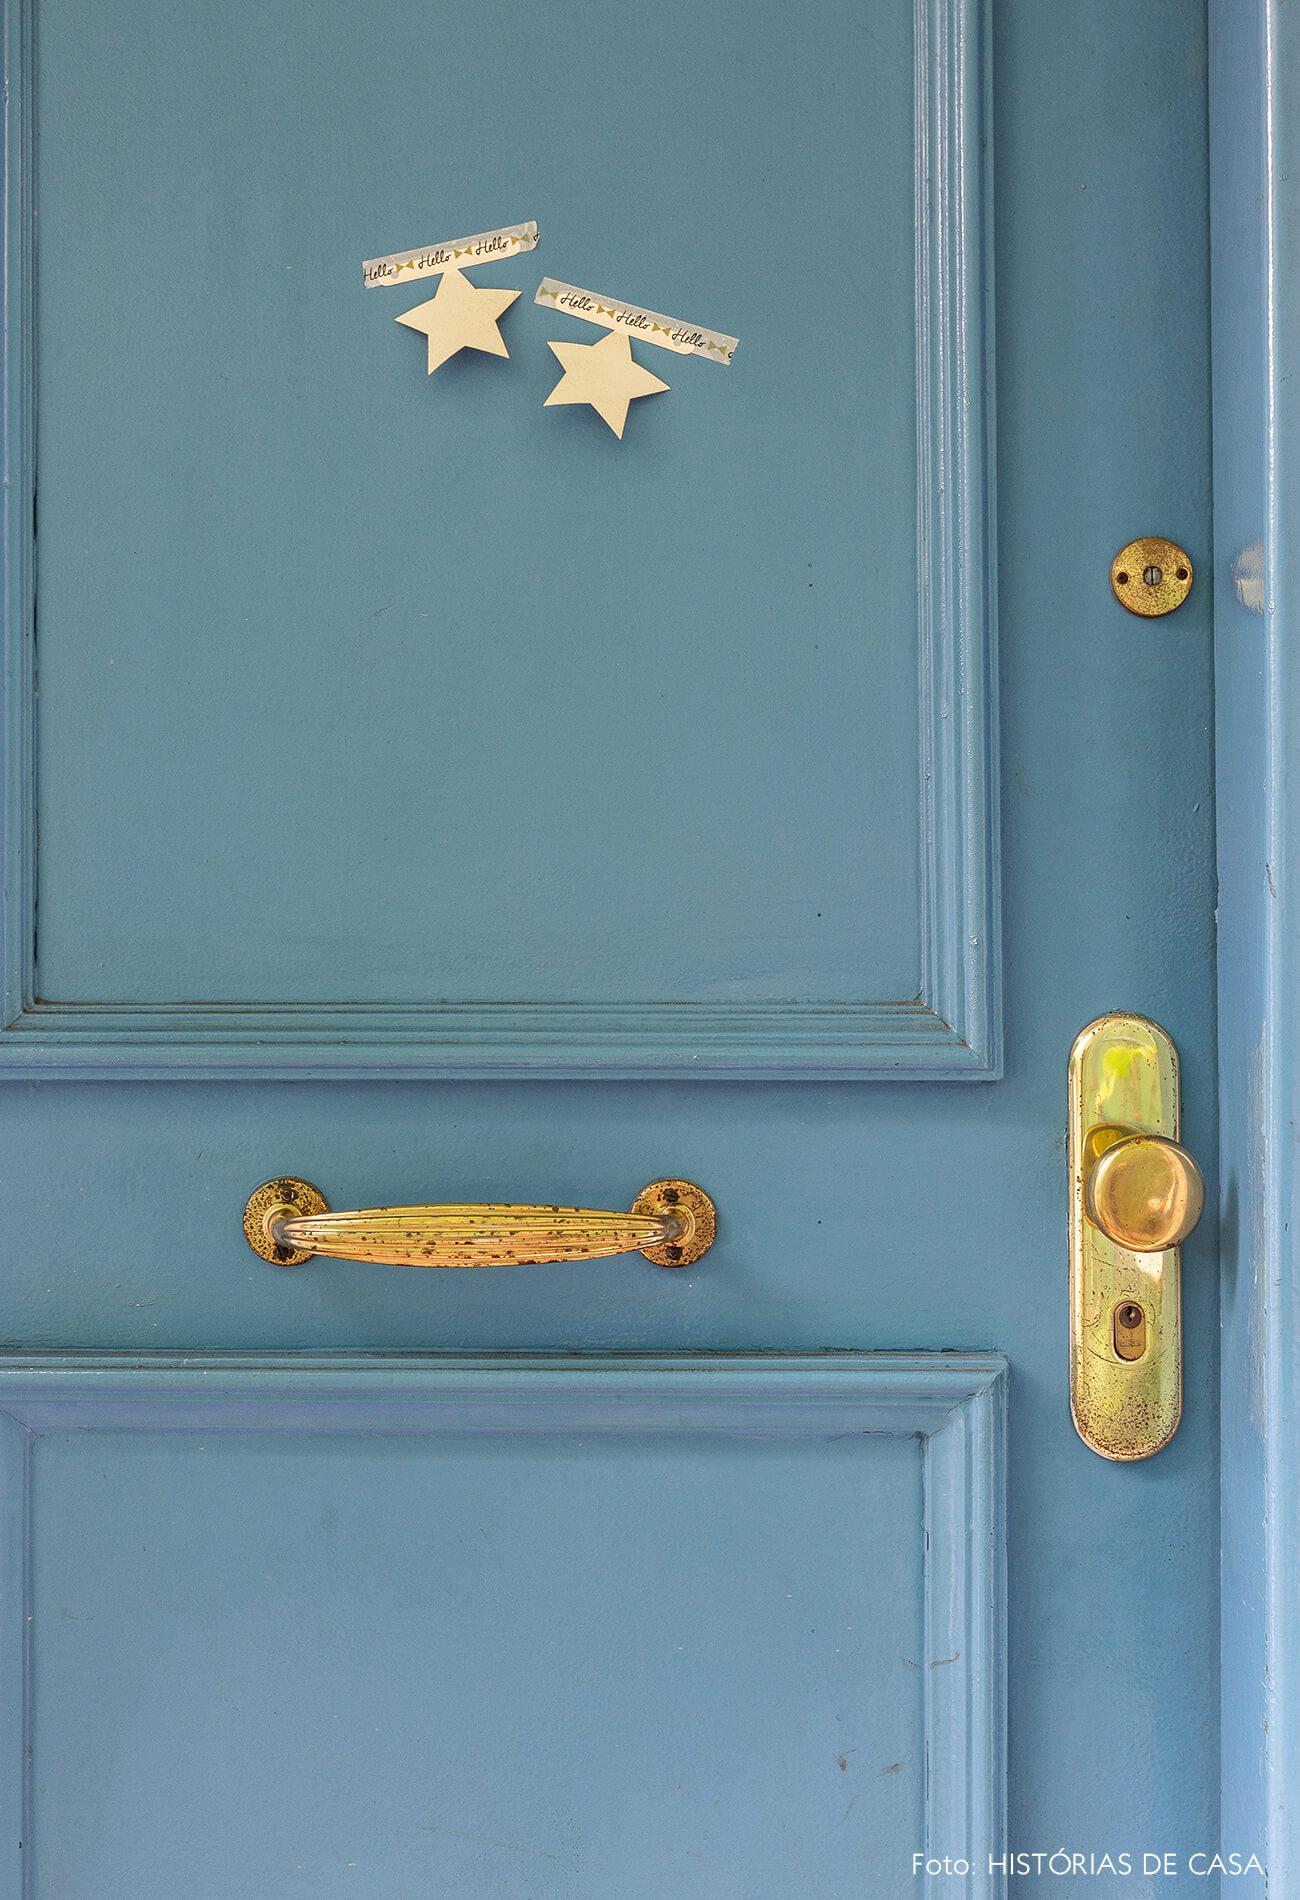 Casa com fachada charmosa e portas pintadas de azul